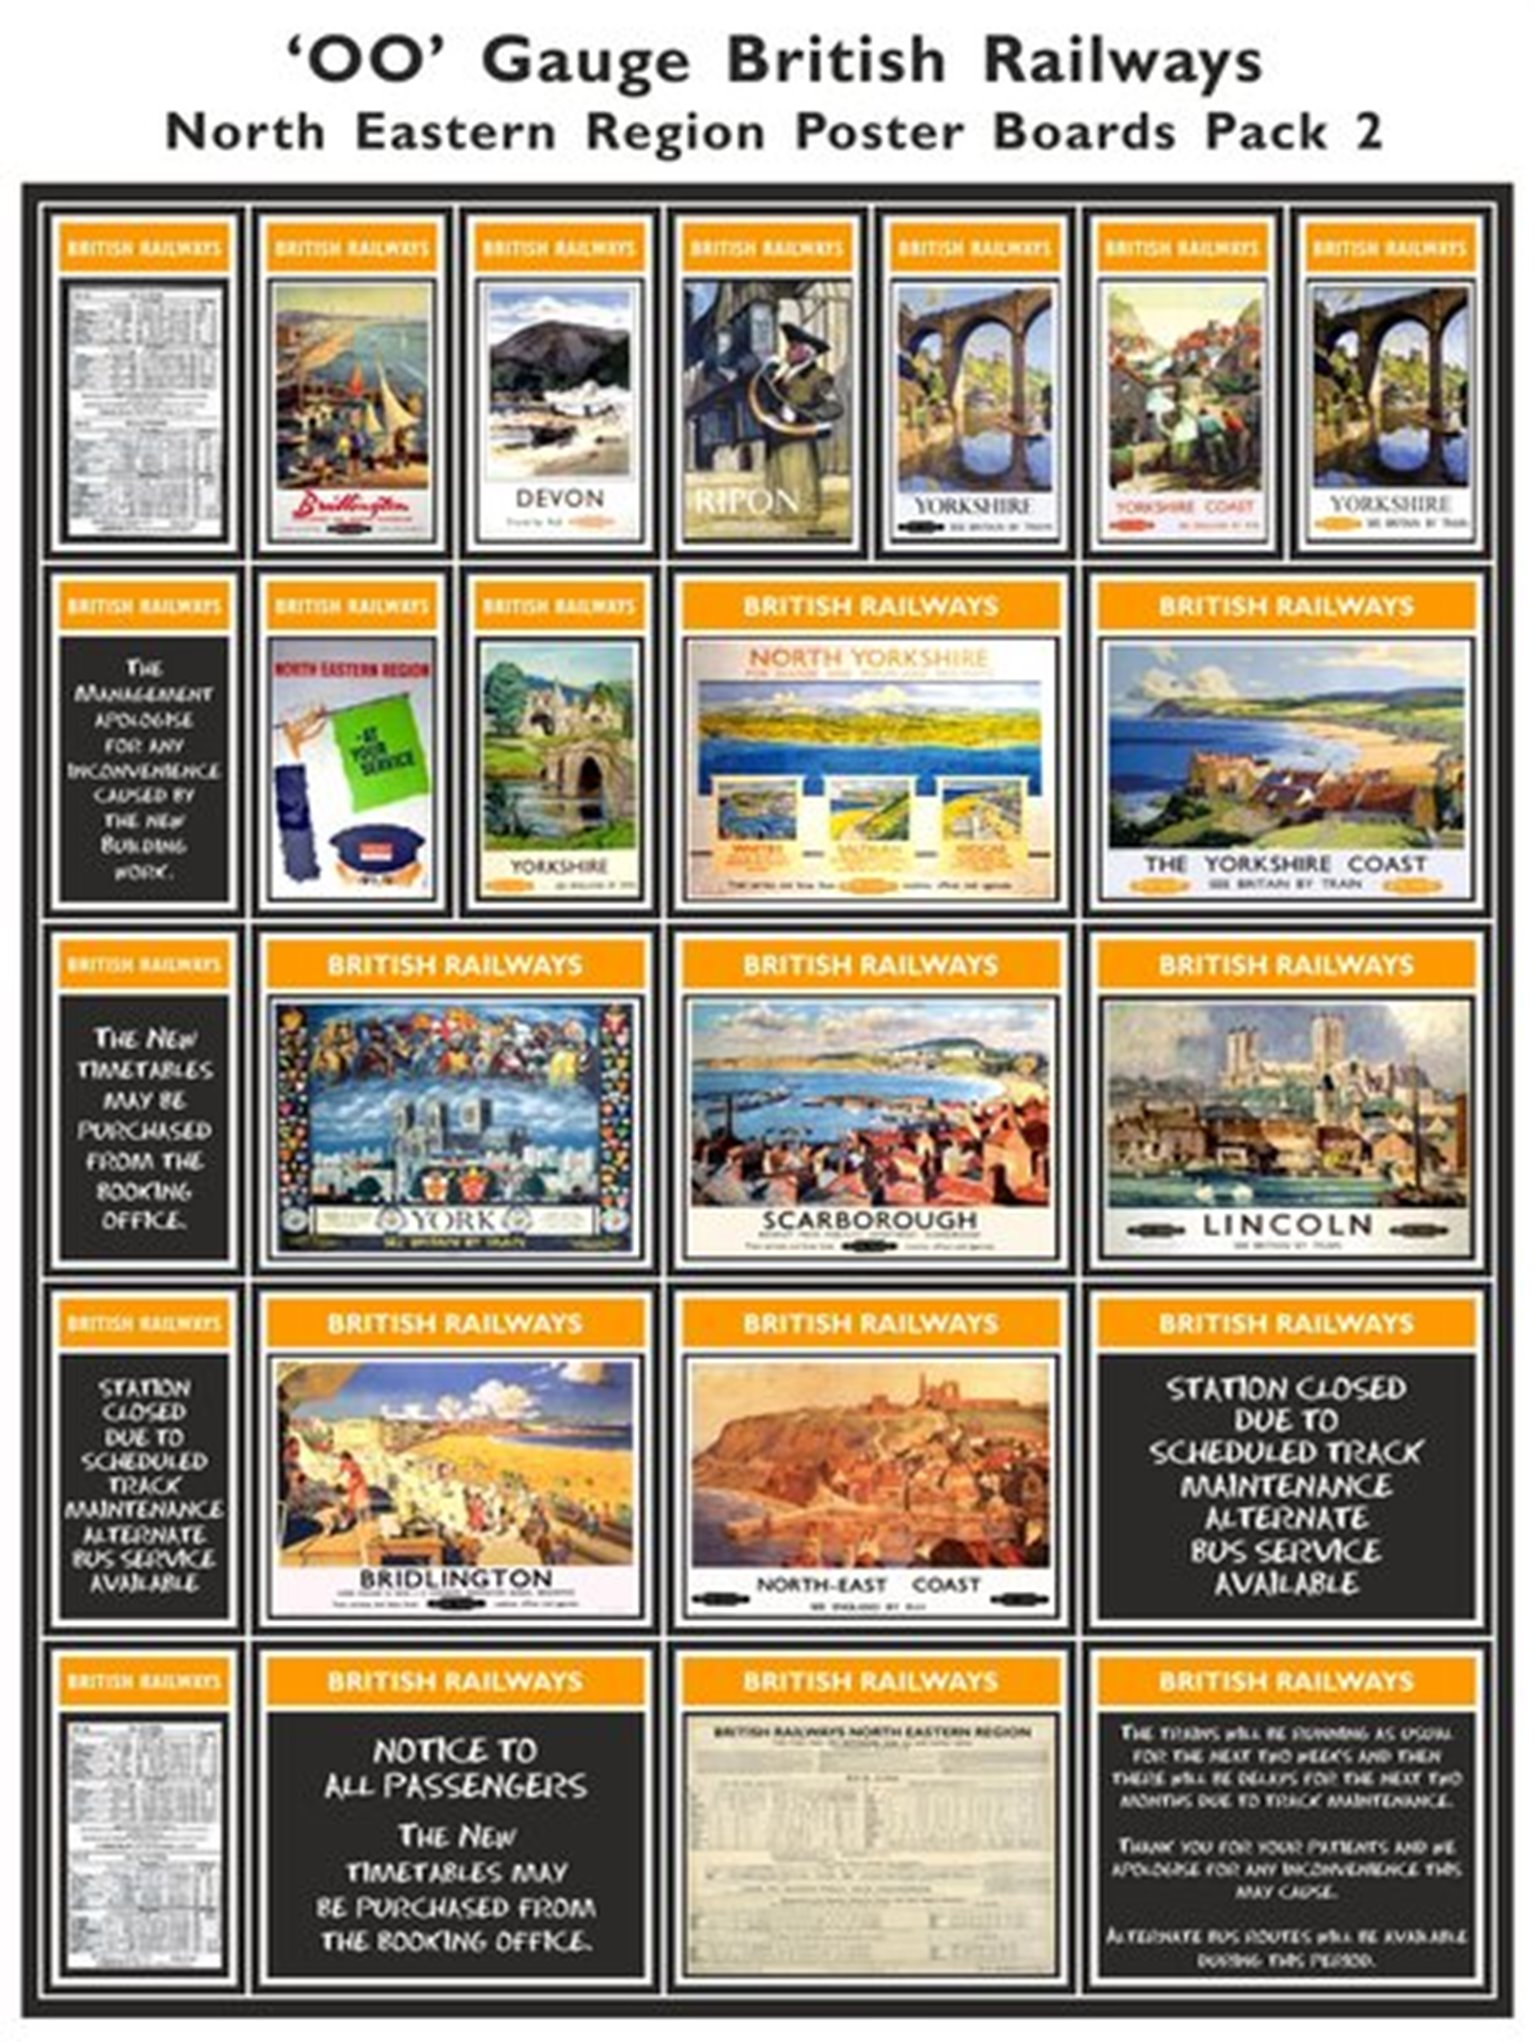 British Railways North Eastern Region Poster Boards Pack 2